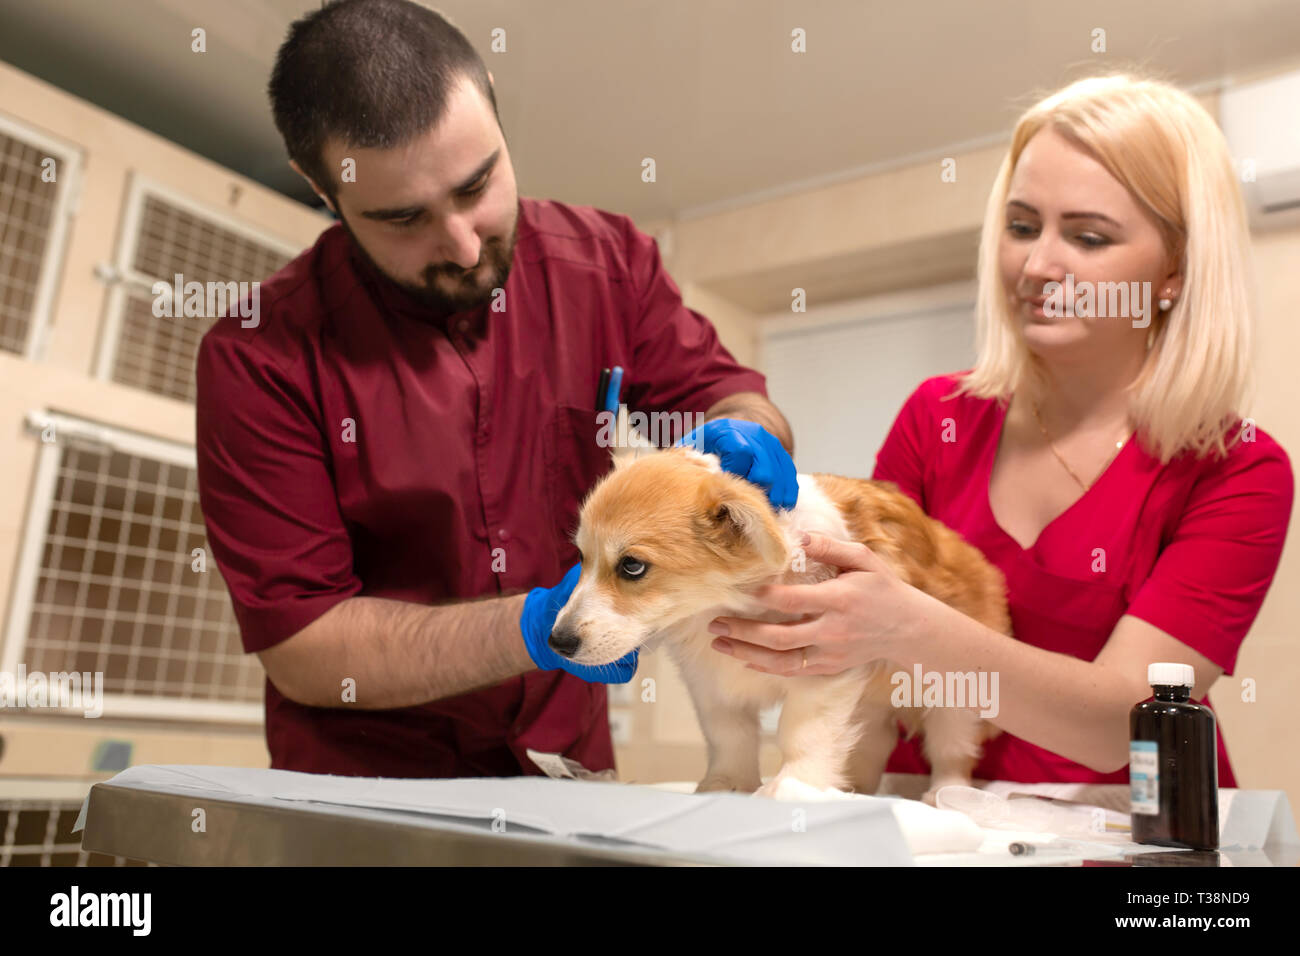 Veterinary doctors exam little corgi dog in manipulation room of pet clinic. Pet health care. - Stock Image